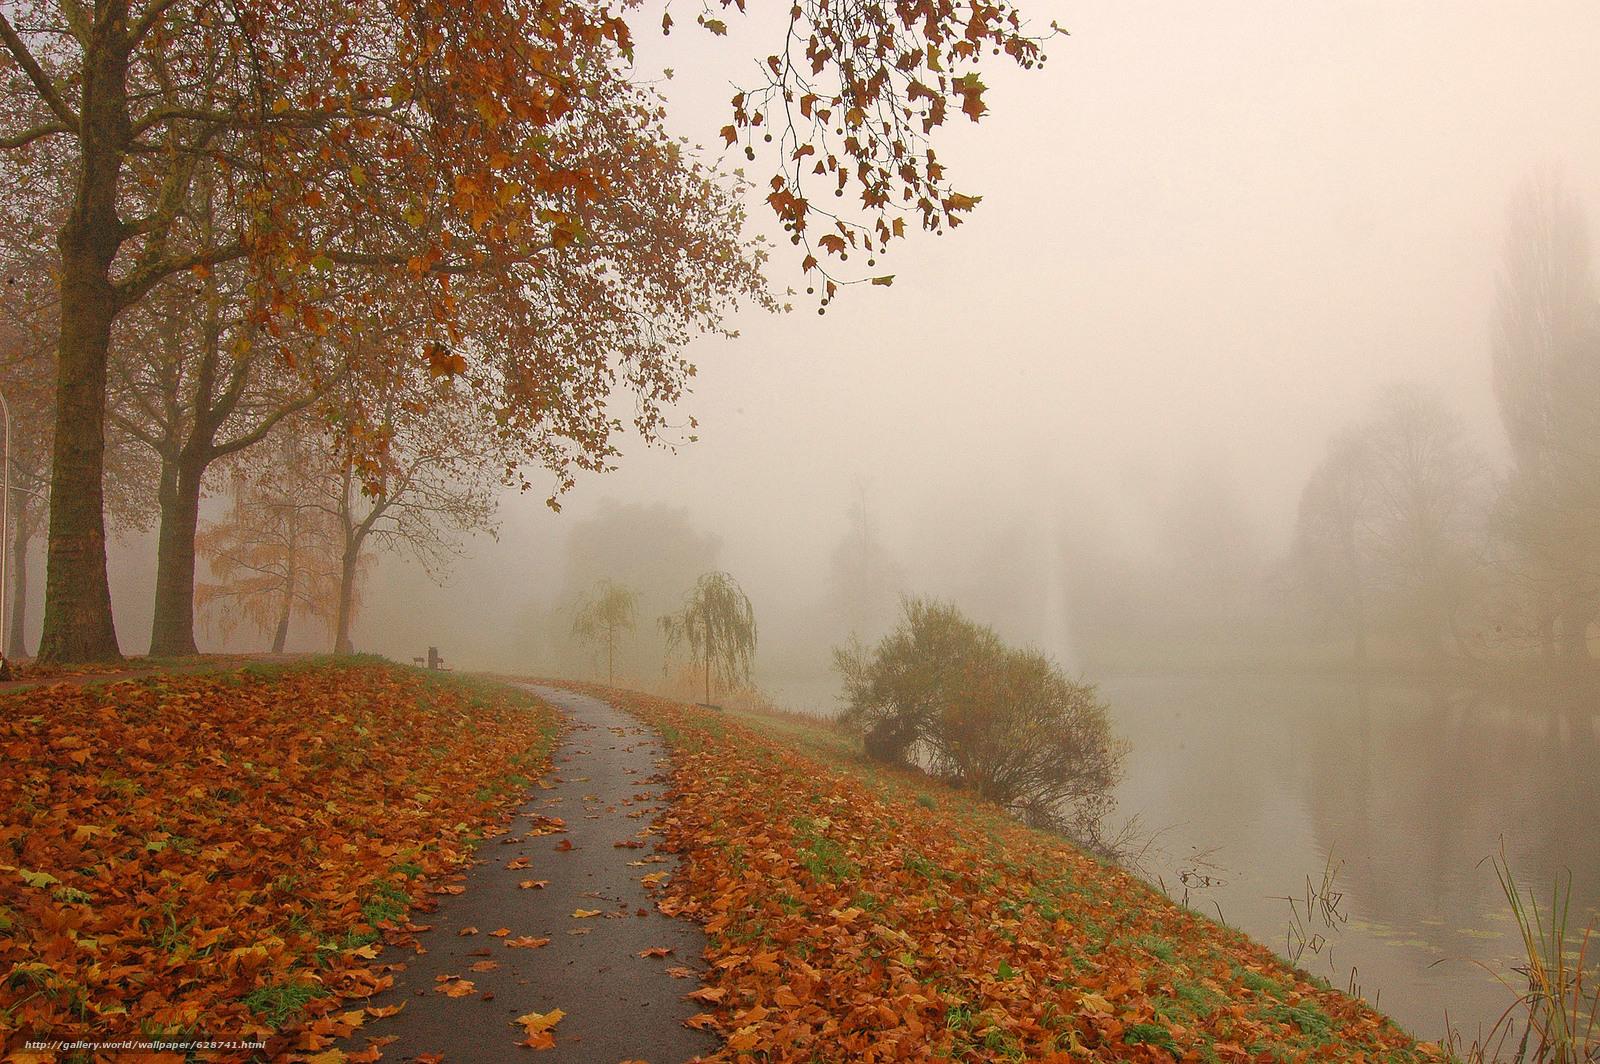 осень, дорога, парк, канал, деревья, туман, пейзаж